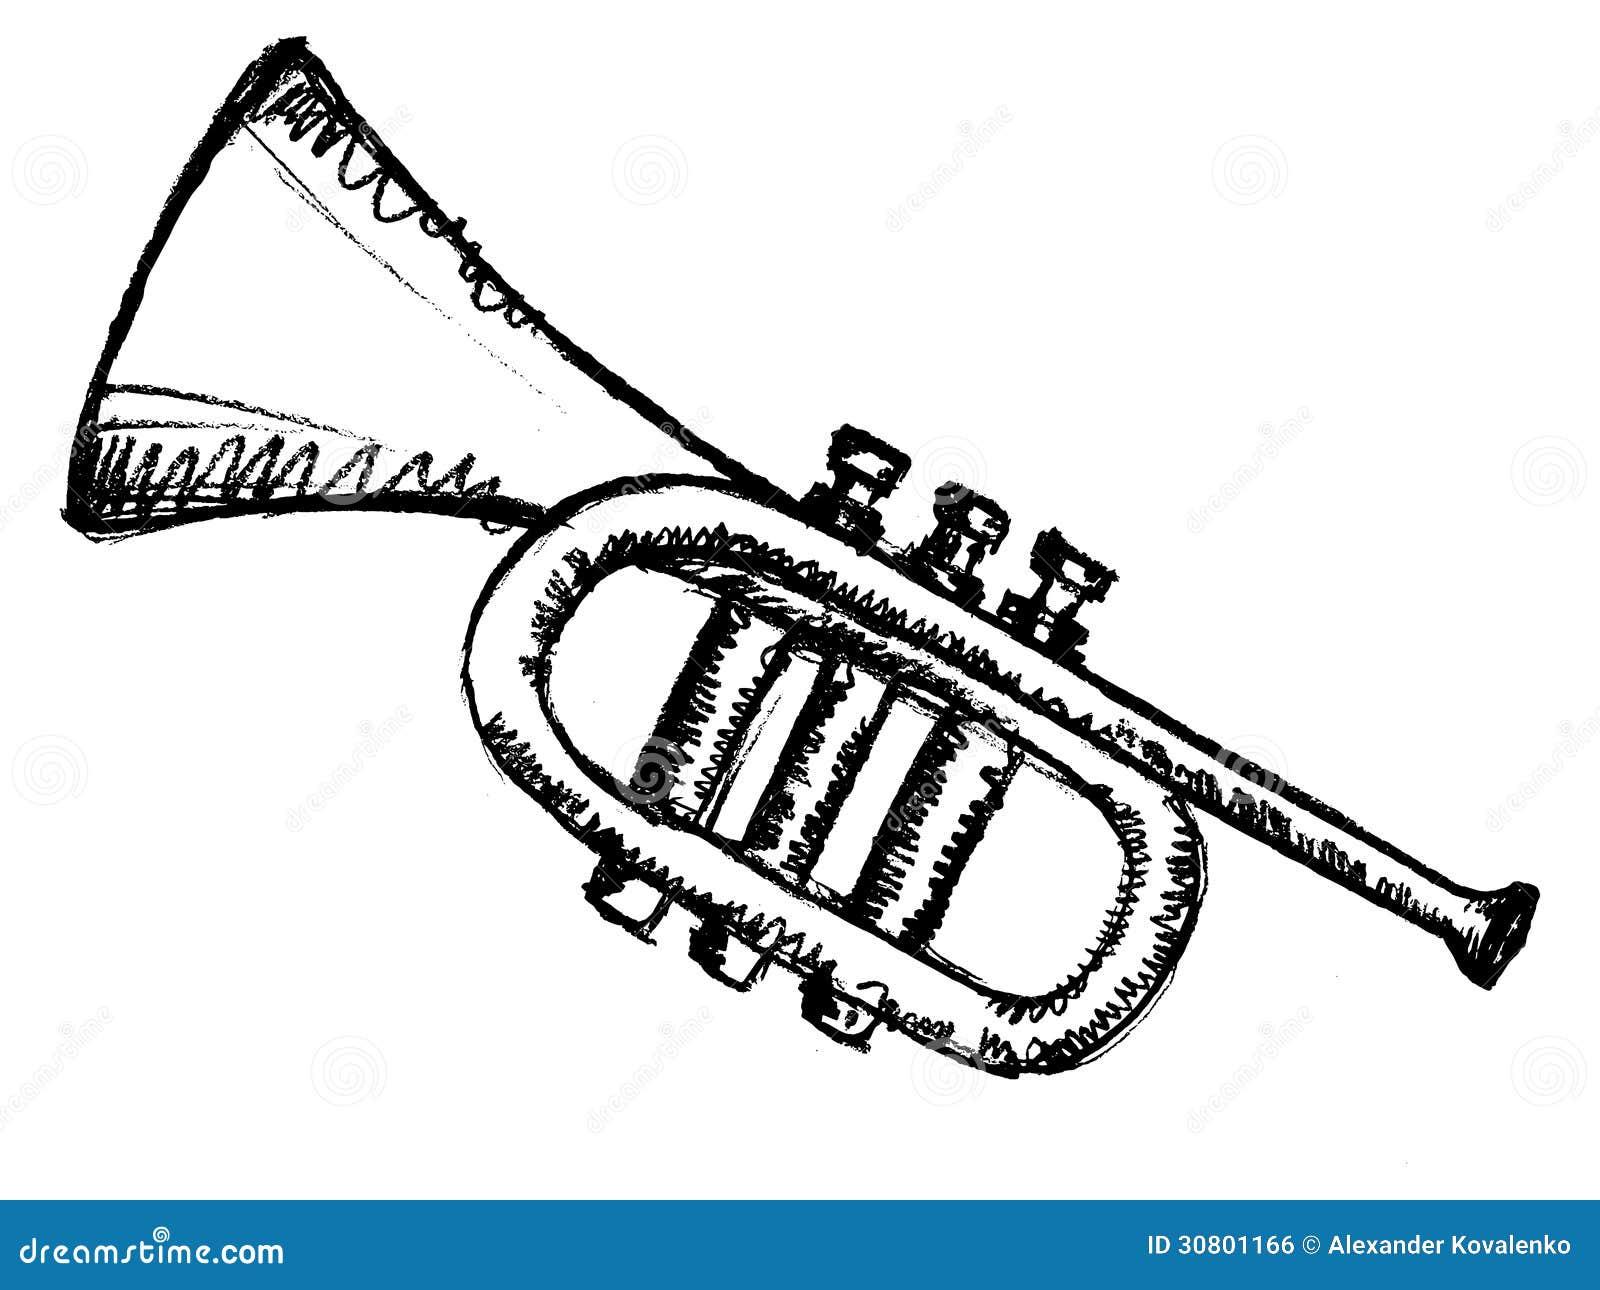 horn musical instrument royalty free stock image image. Black Bedroom Furniture Sets. Home Design Ideas